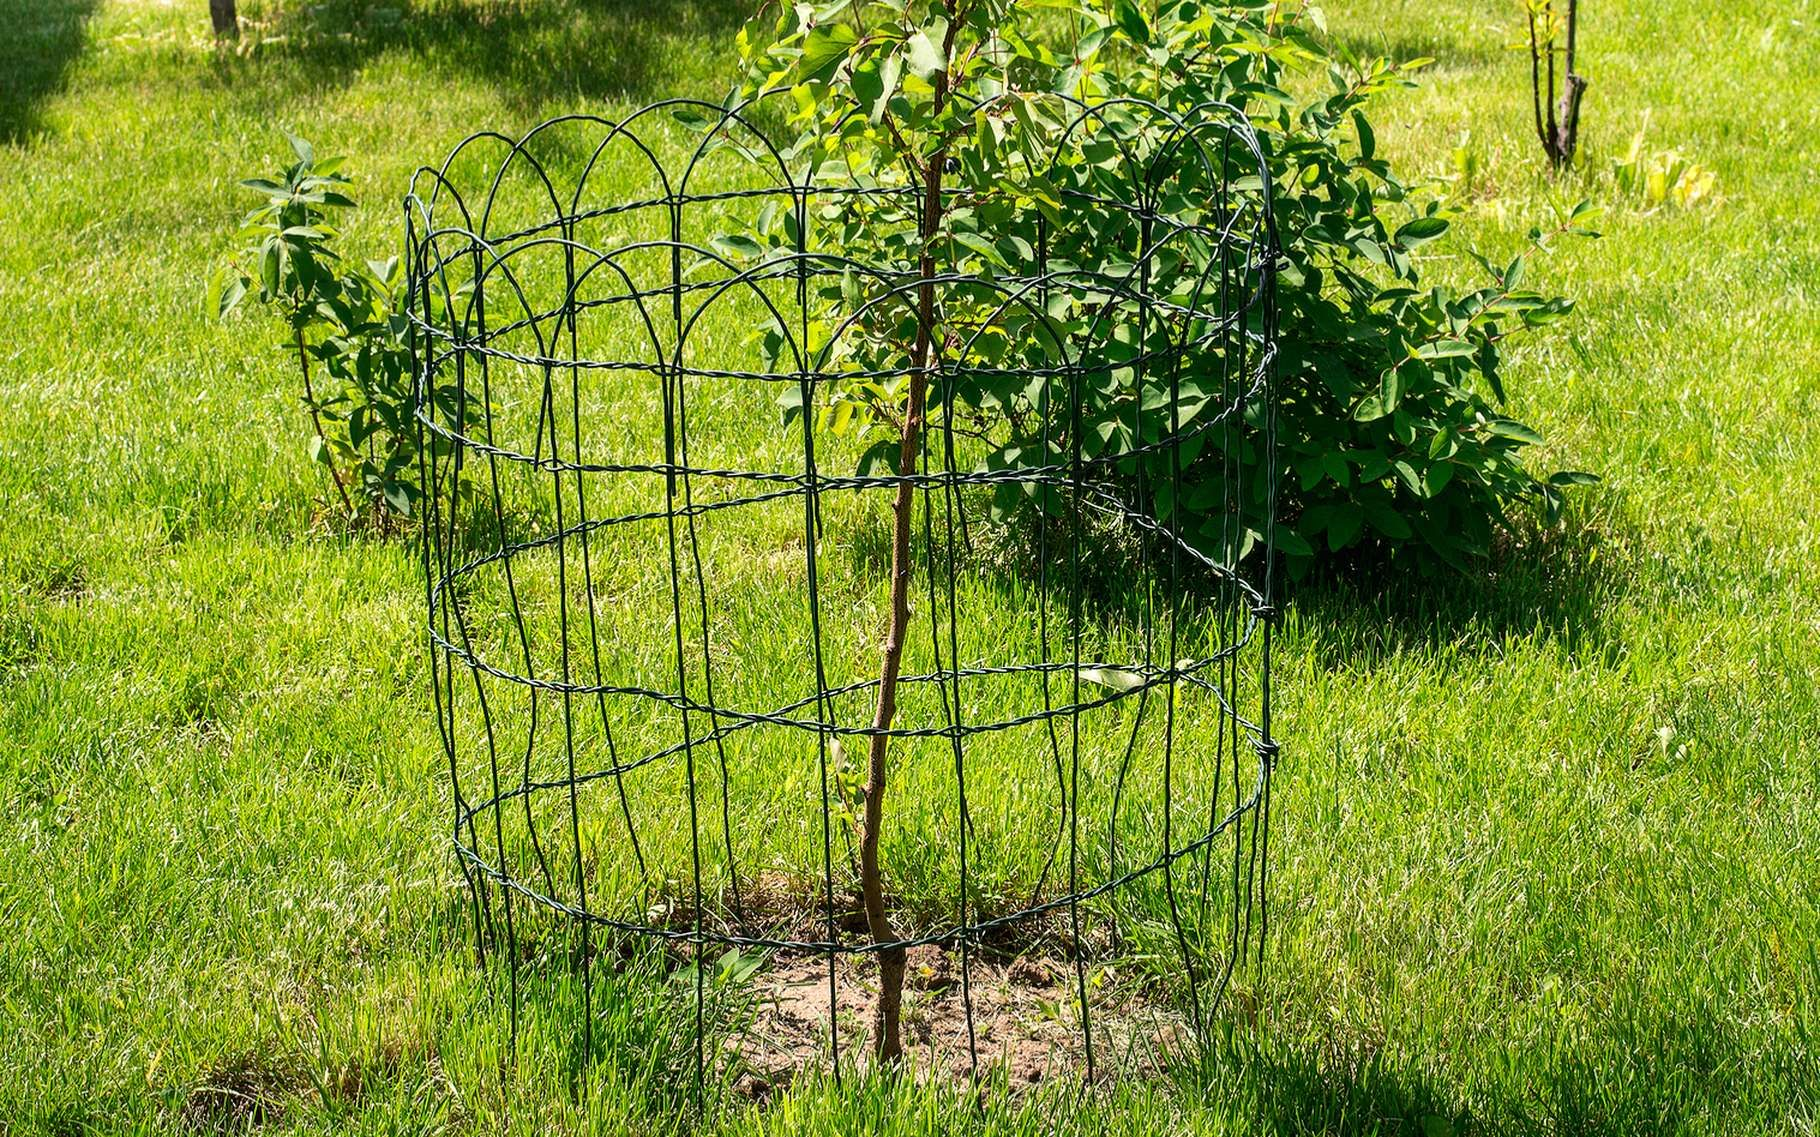 Quand planter un arbre ? | Planter des arbres, Arbre, Jardinage